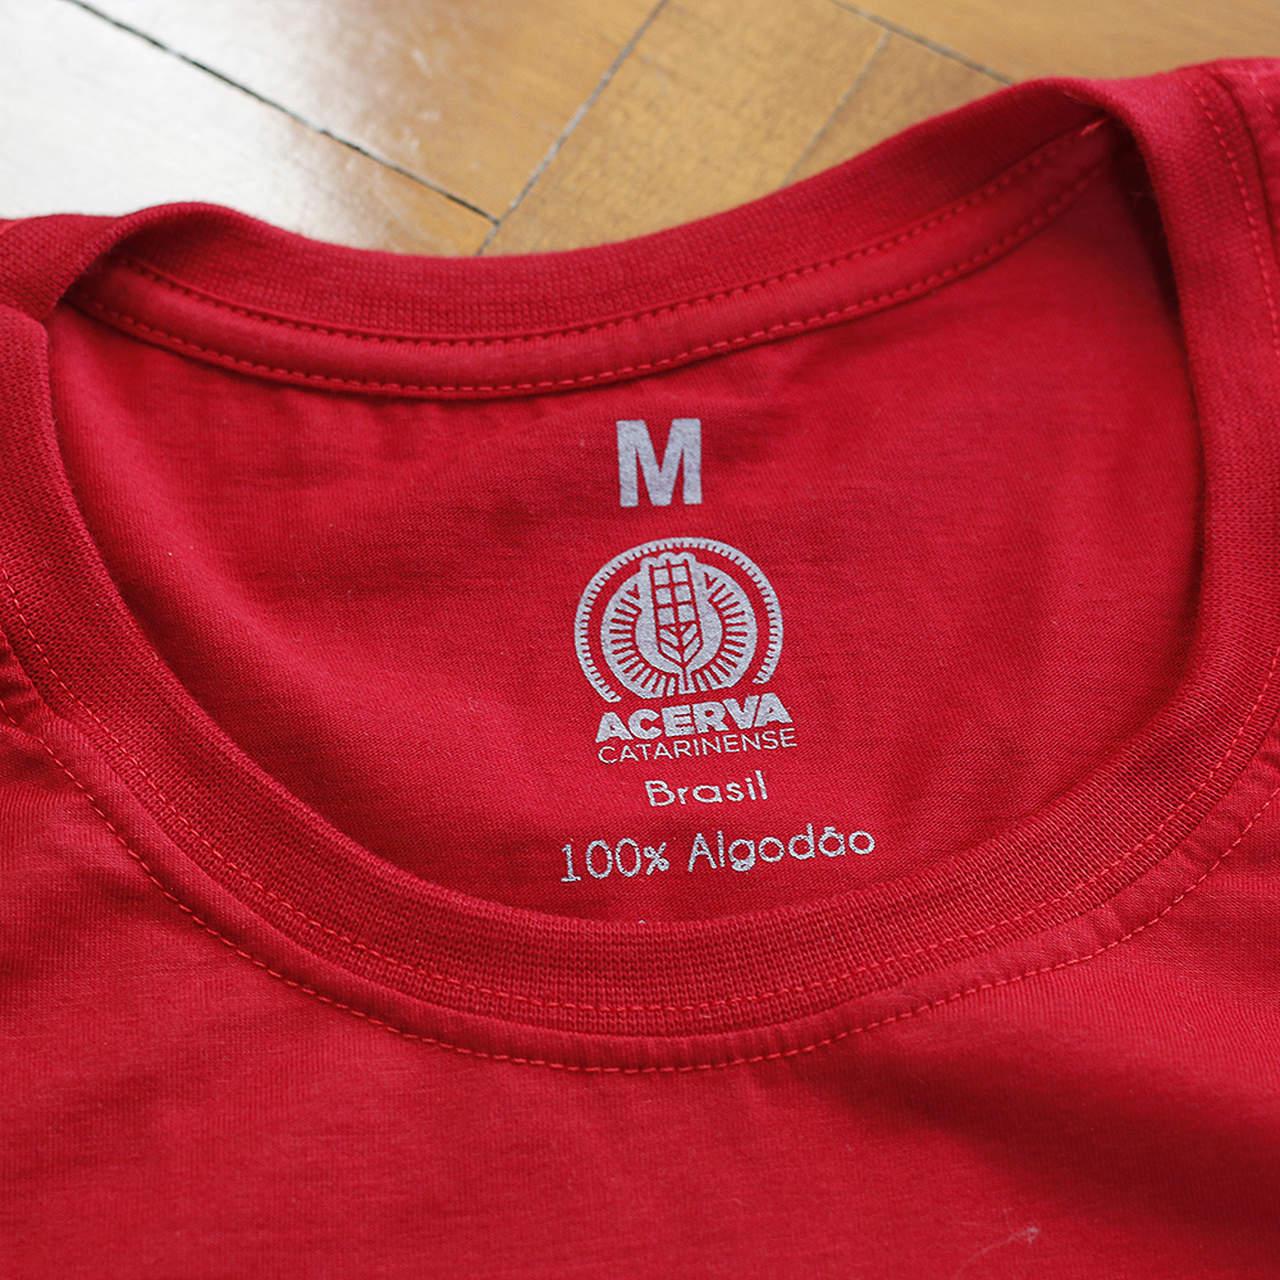 Camiseta Baby Look Acerva Catarinense Vermelho  - Maria Cervejeira